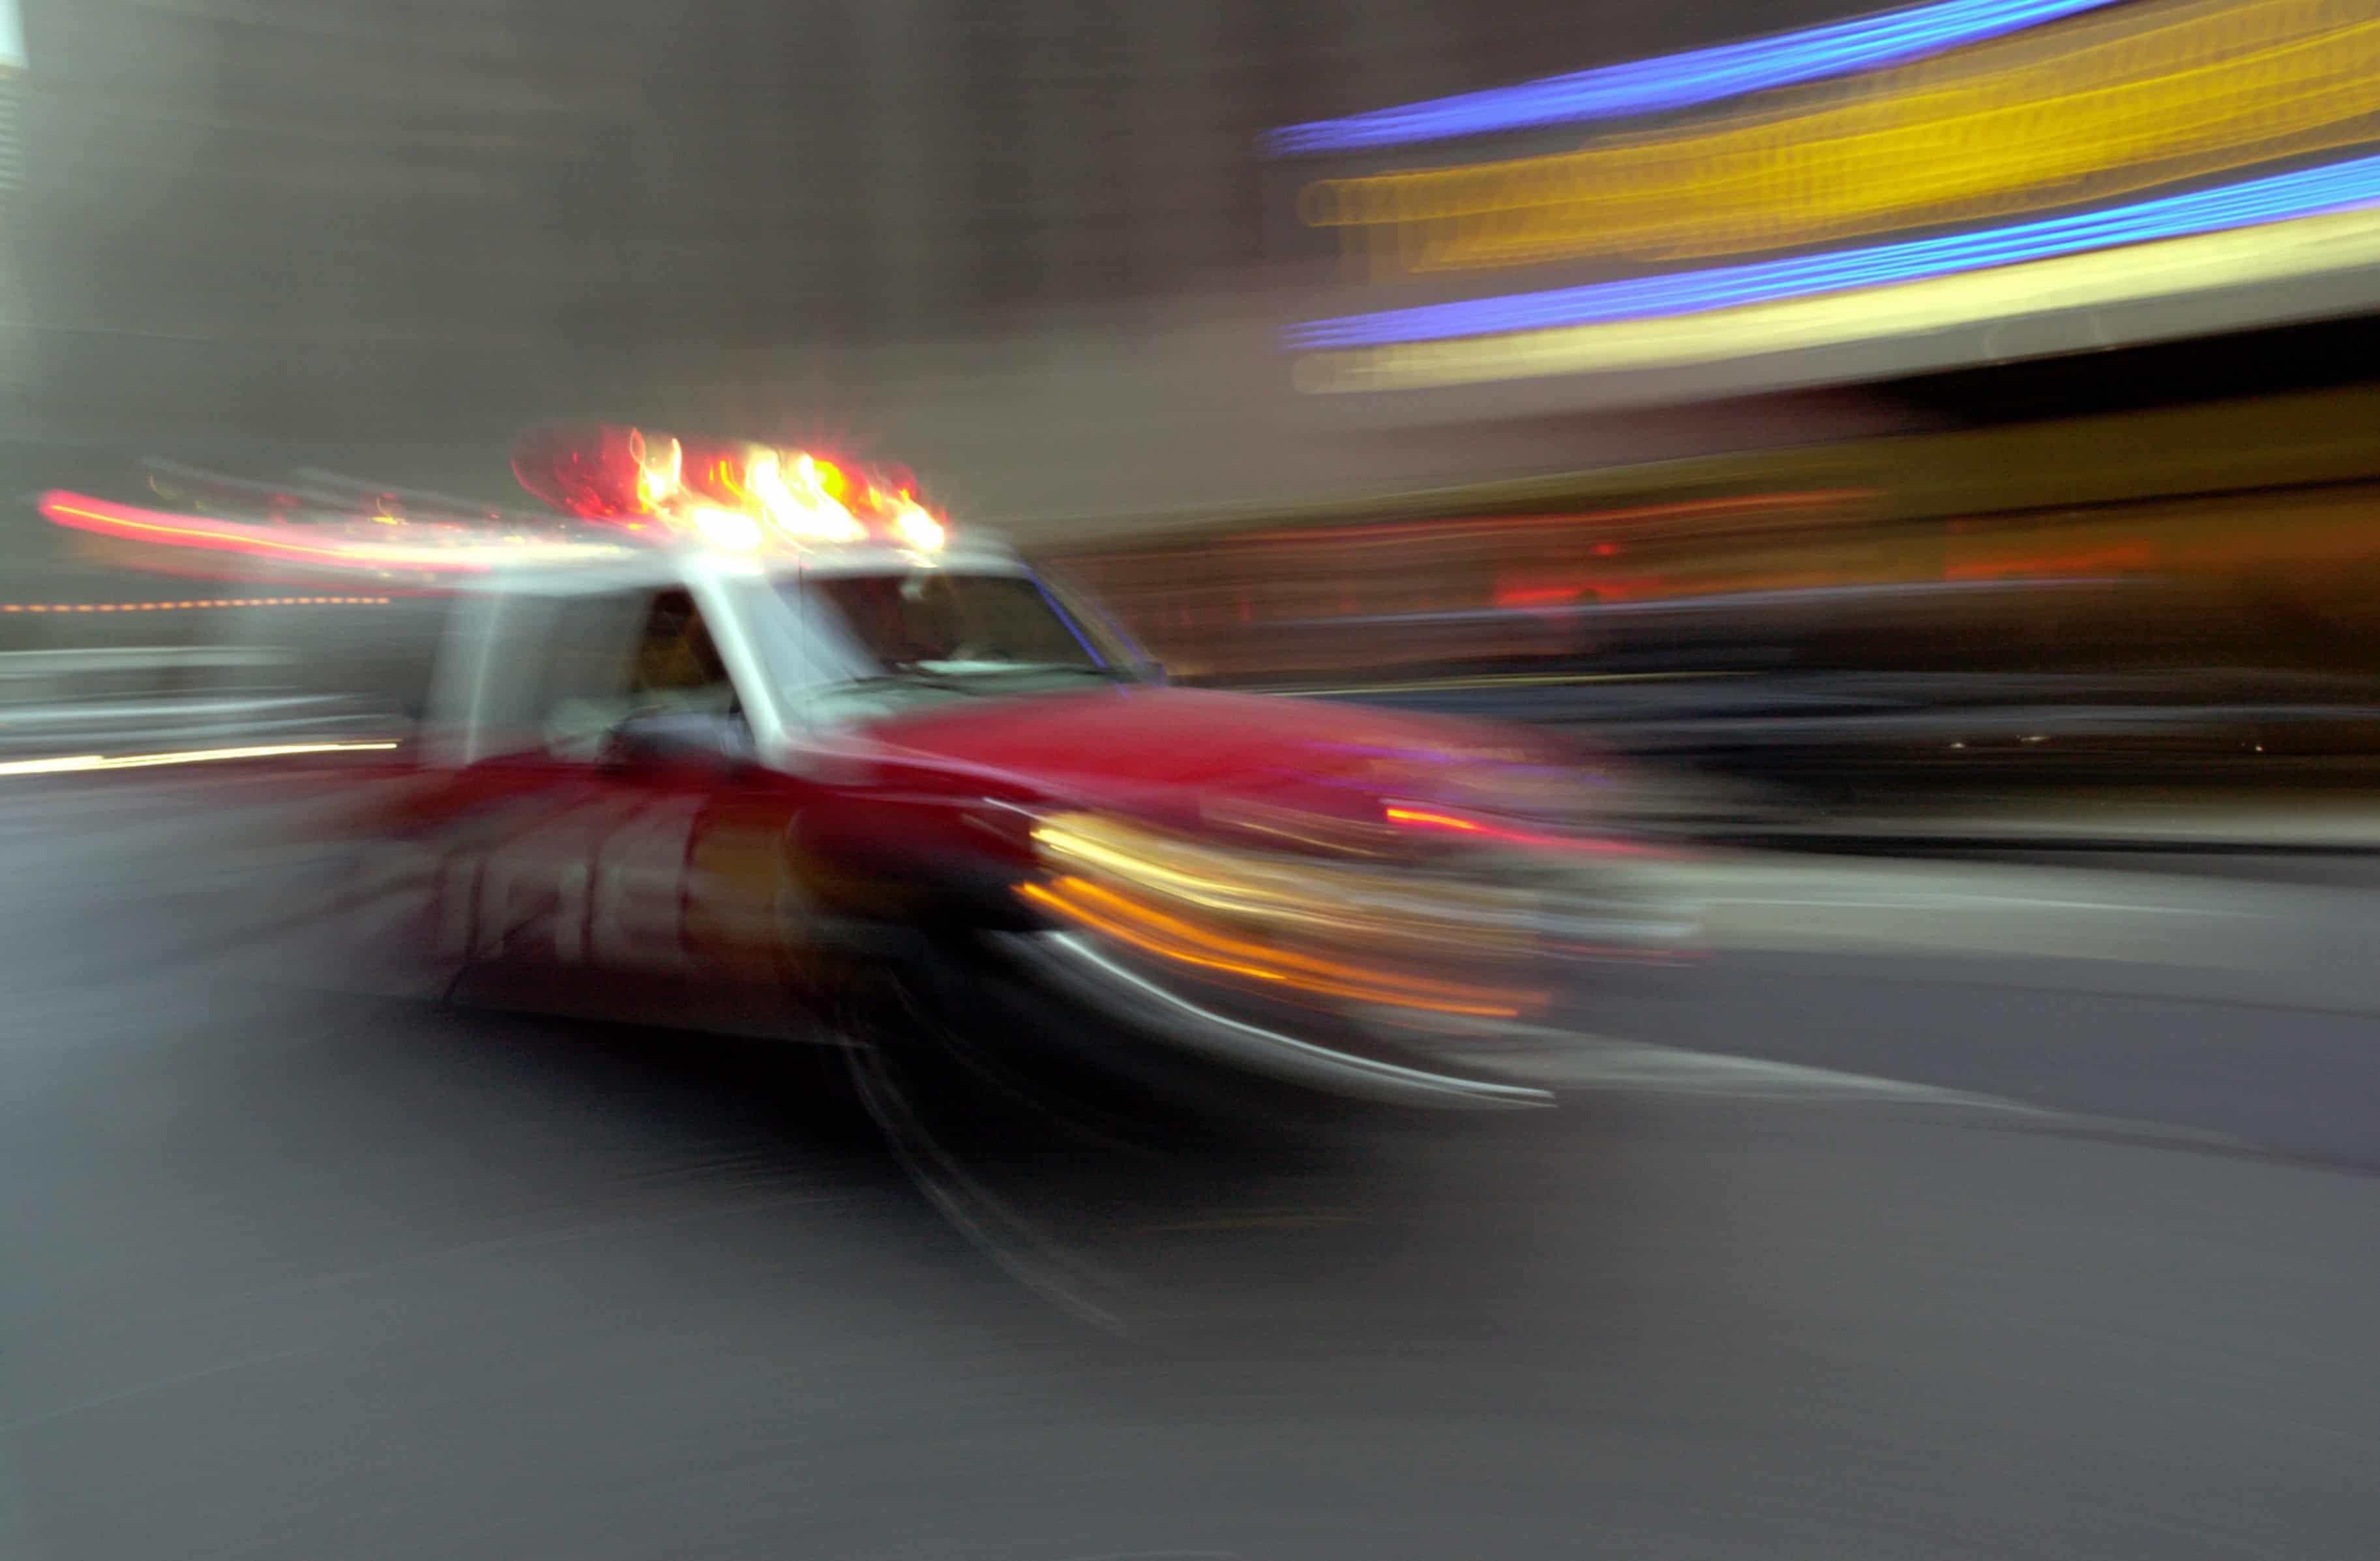 Gas Line Explosion Attorney